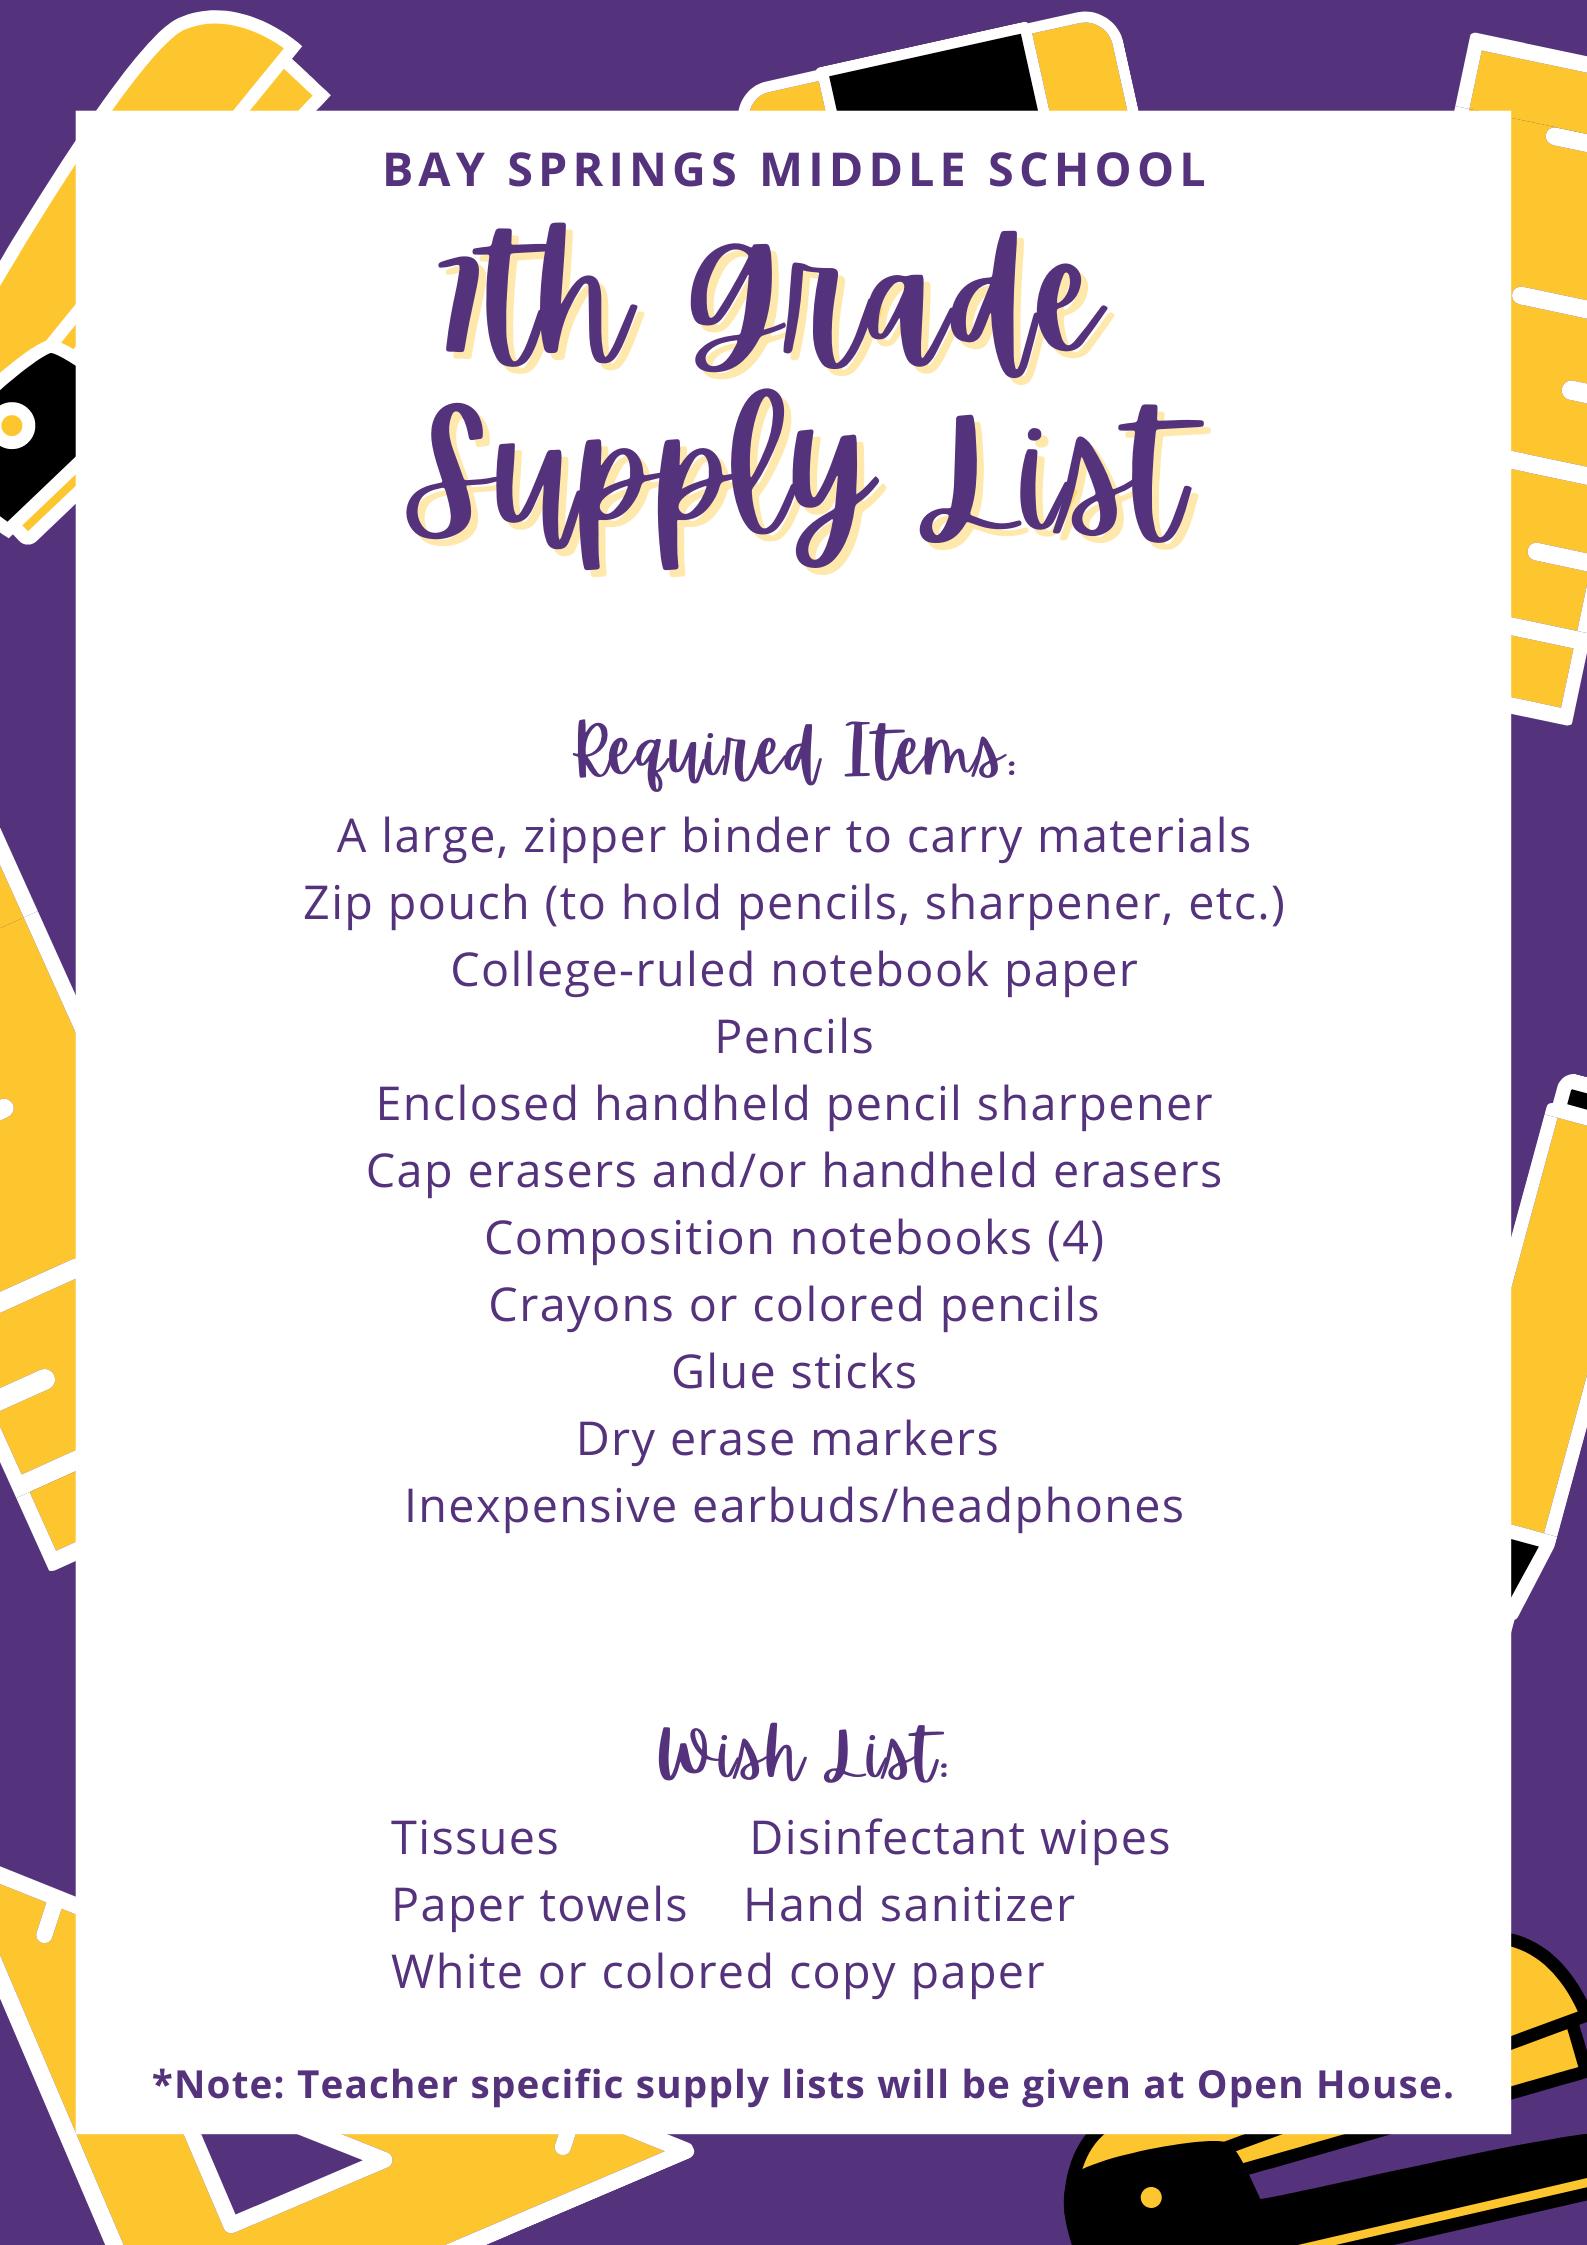 6th Grade School Supply List